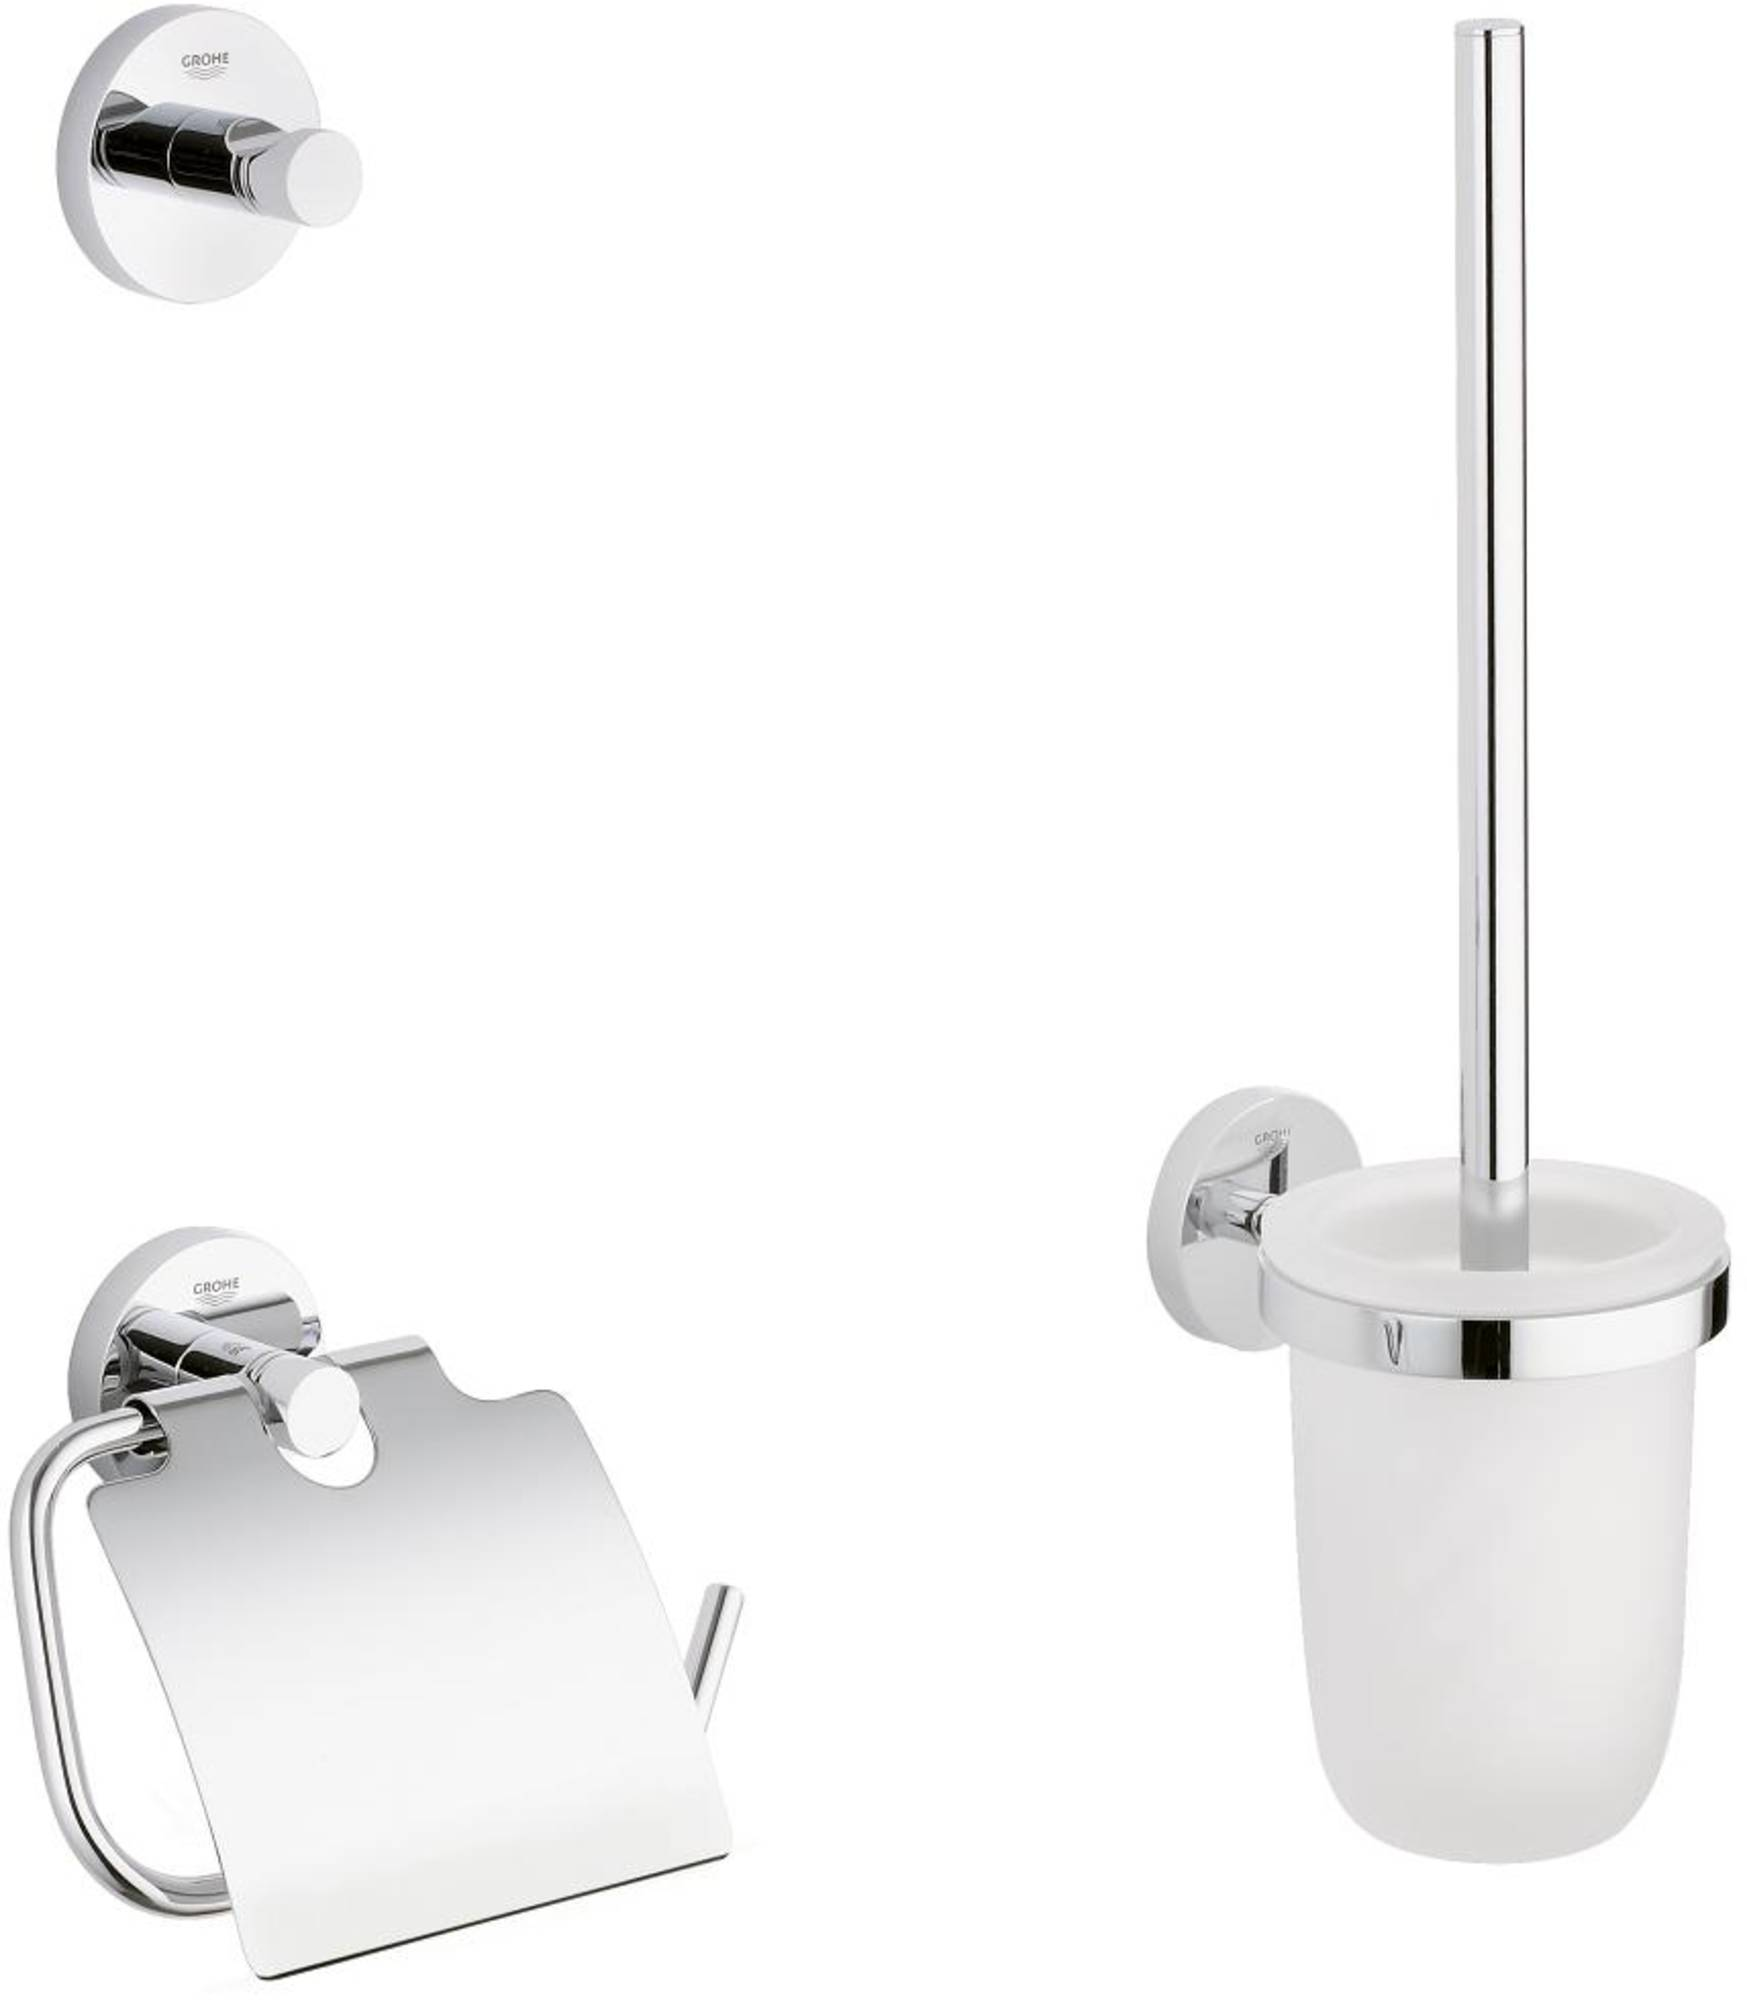 Grohe Essentials accessoireset 3-in-1 (haak-borstelhouder-closetrolhouder) Chroom